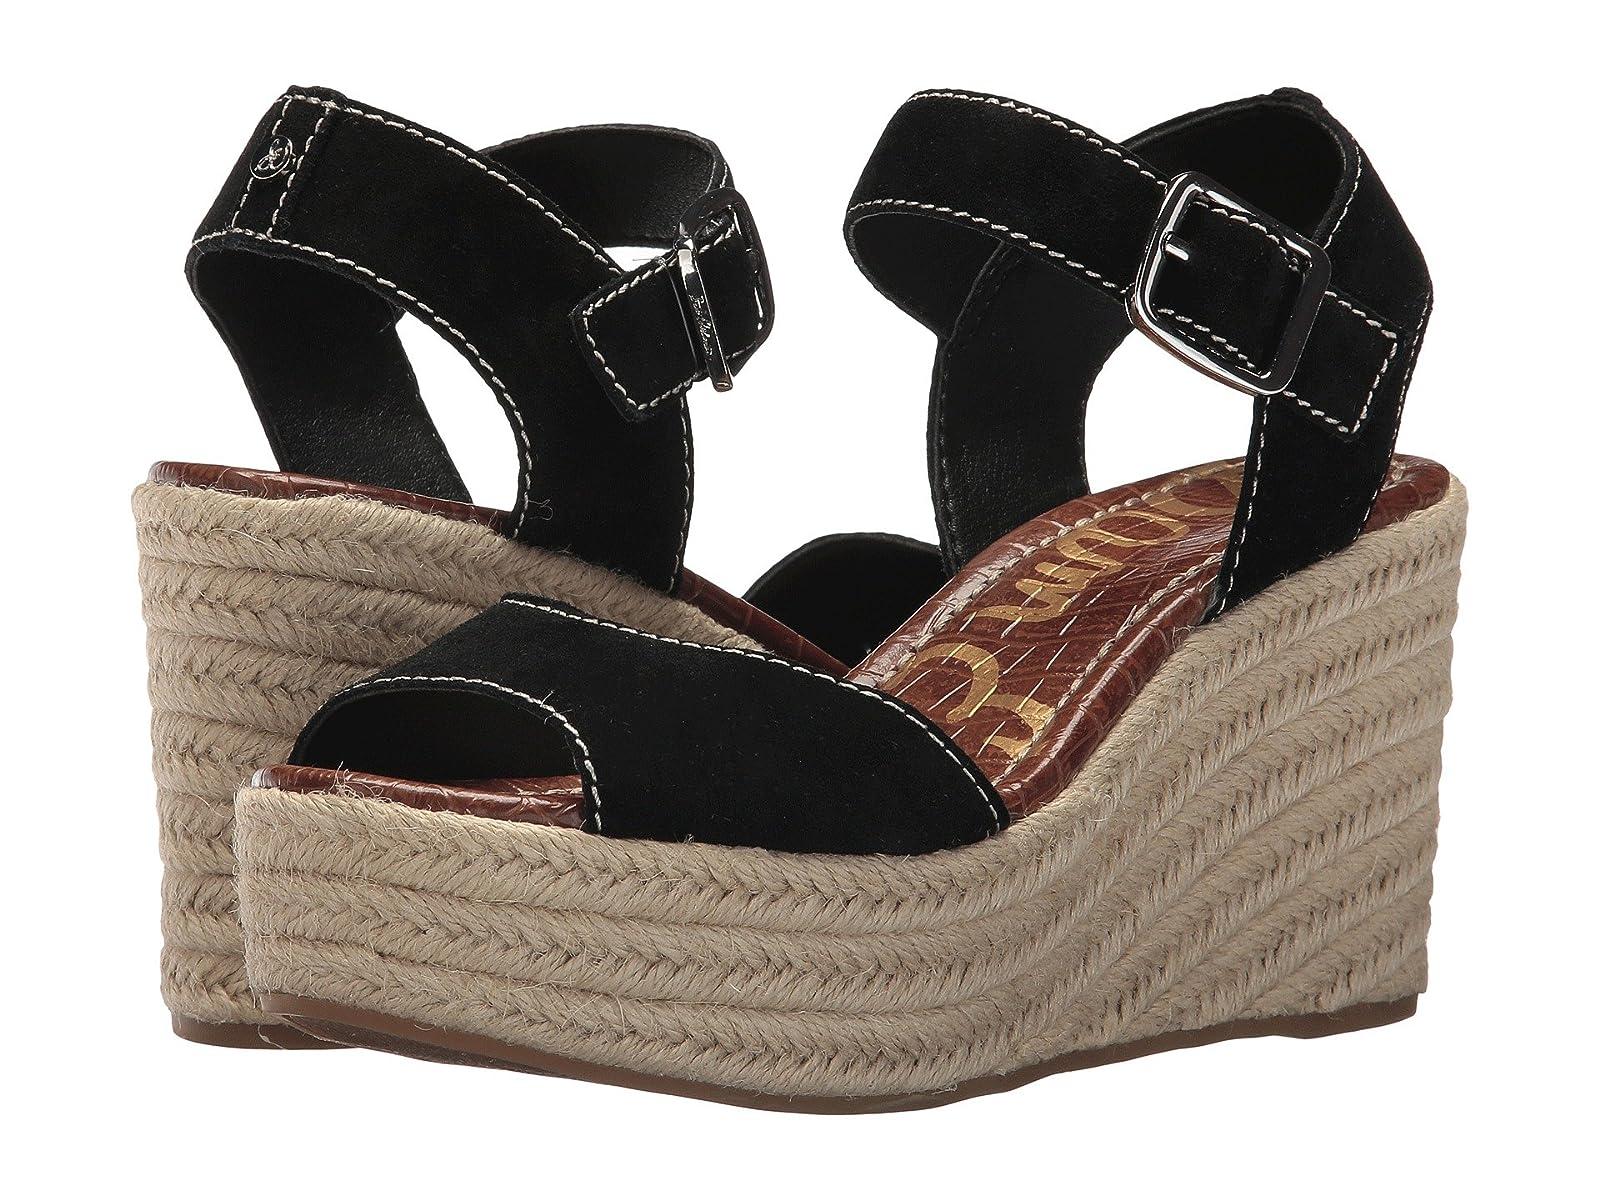 Sam Edelman DimitreeAtmospheric grades have affordable shoes